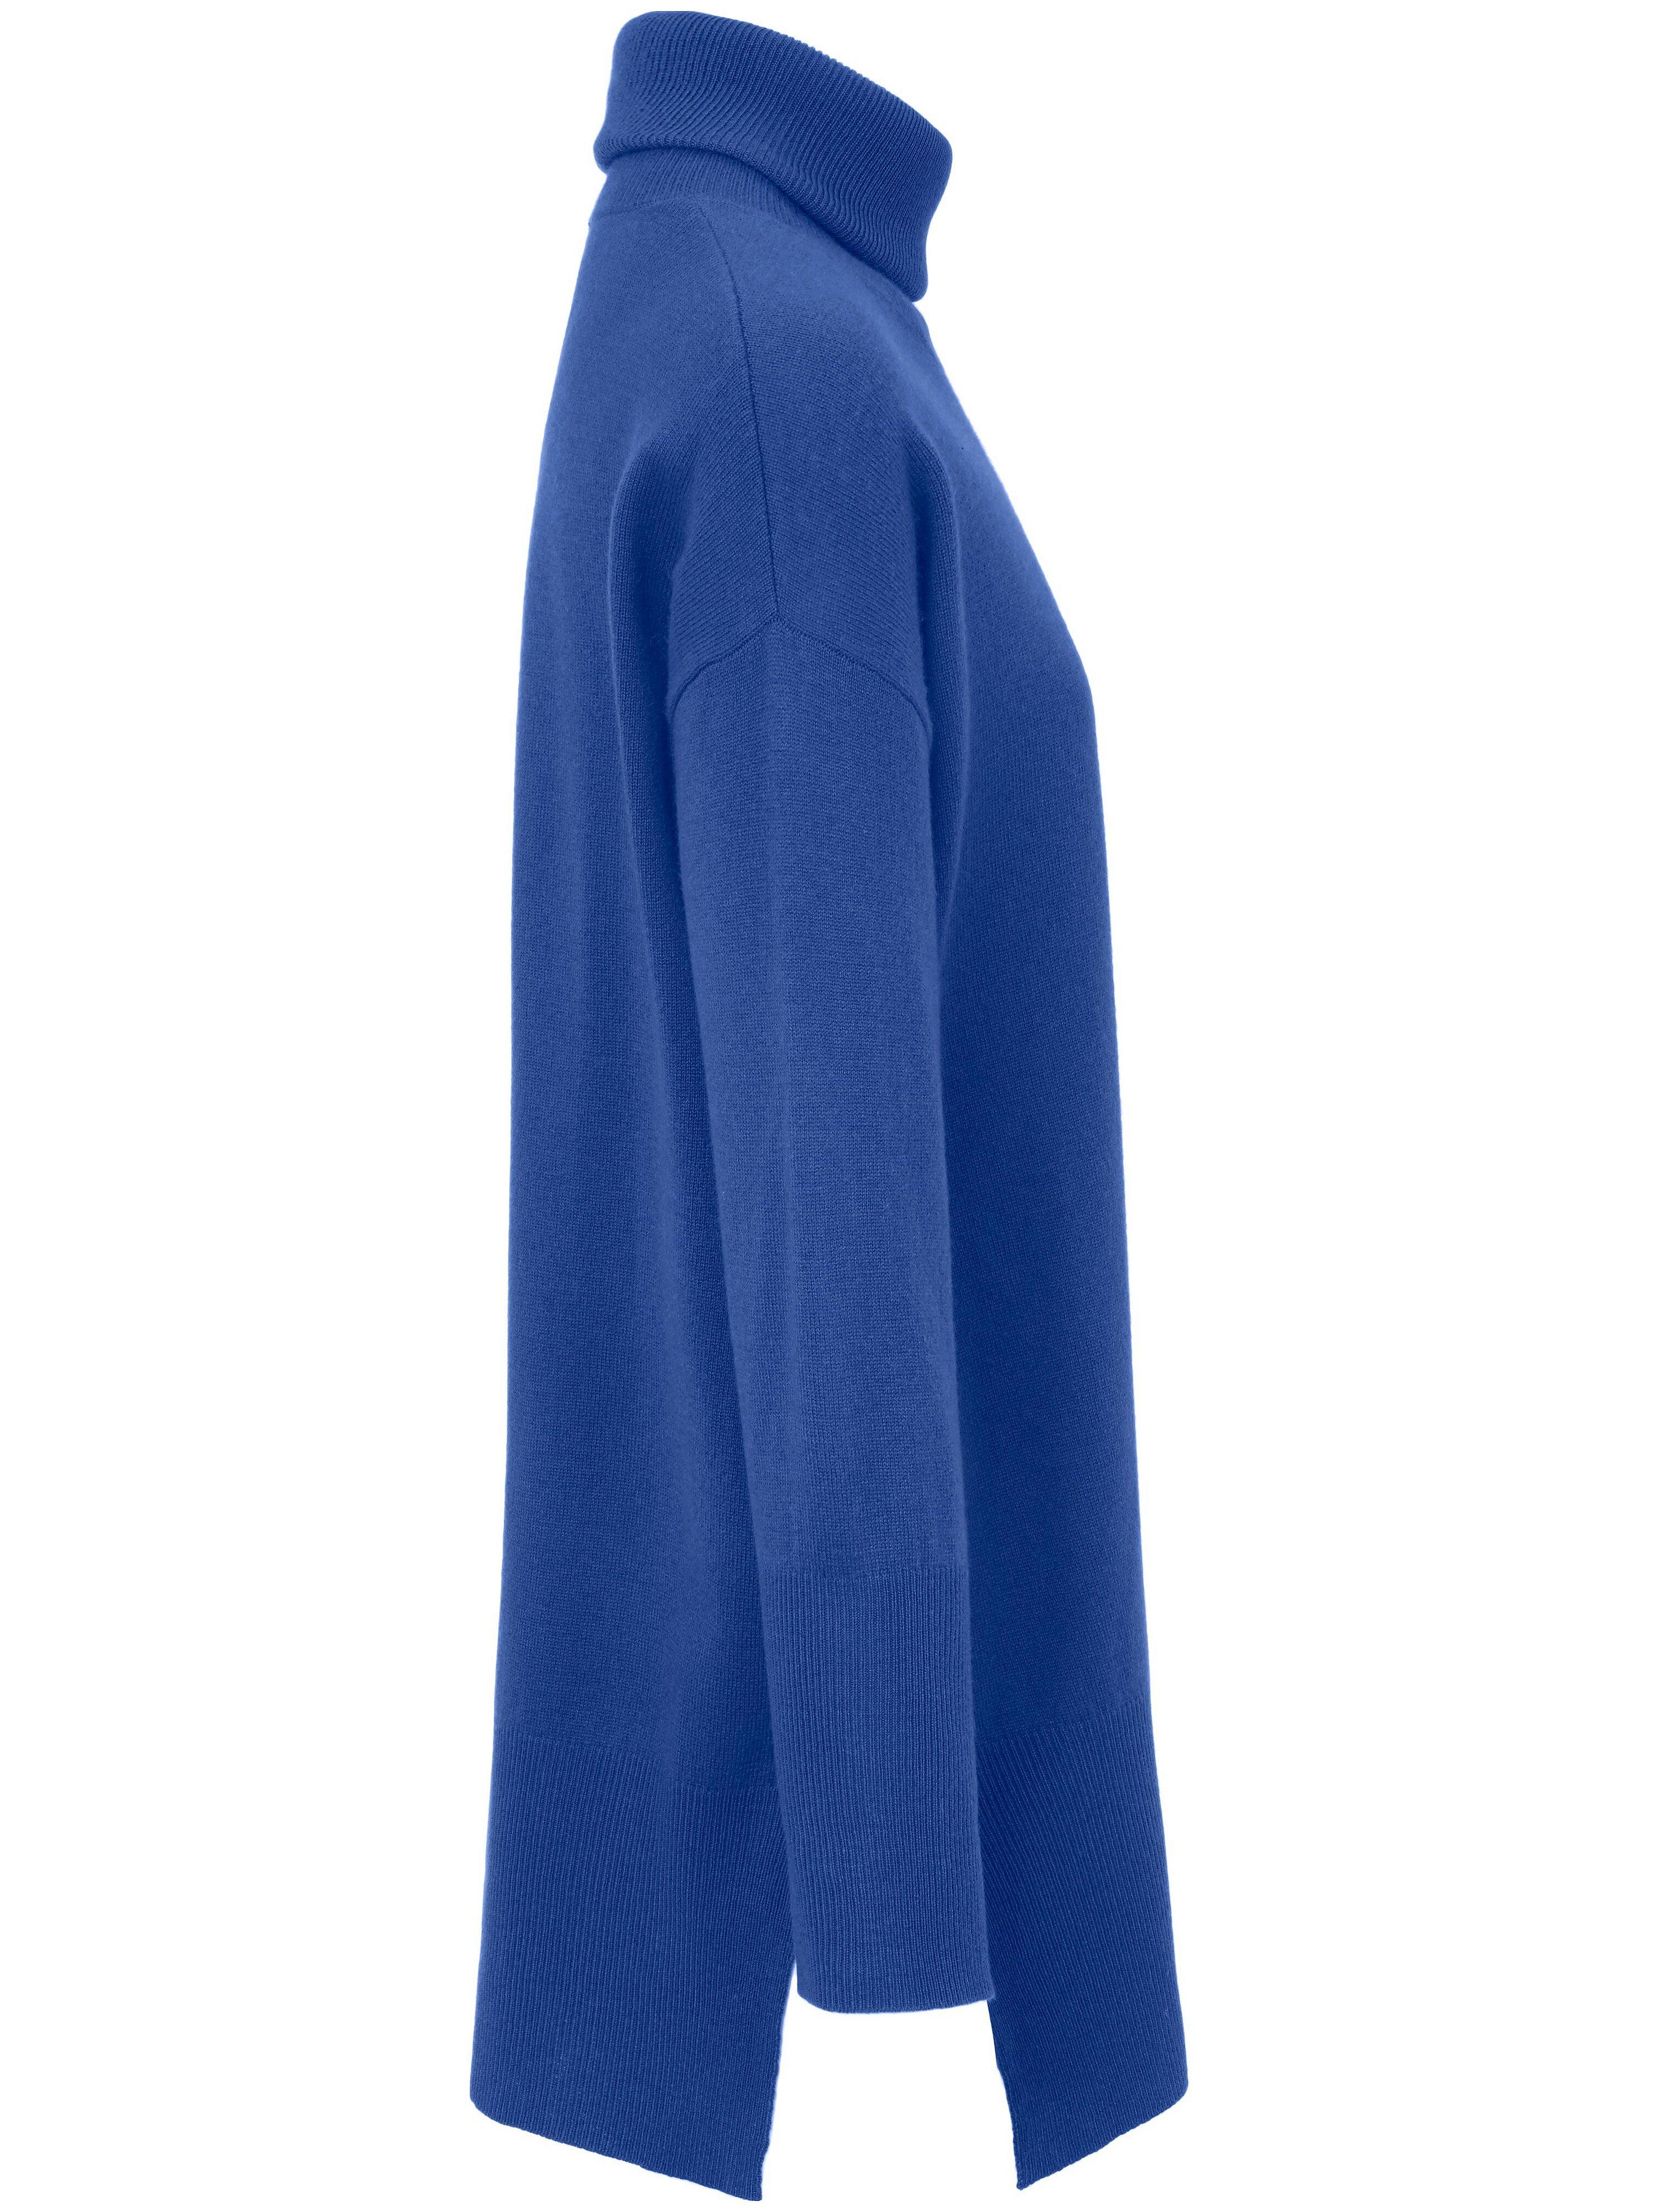 Strikbluse rullekrave Fra include blå